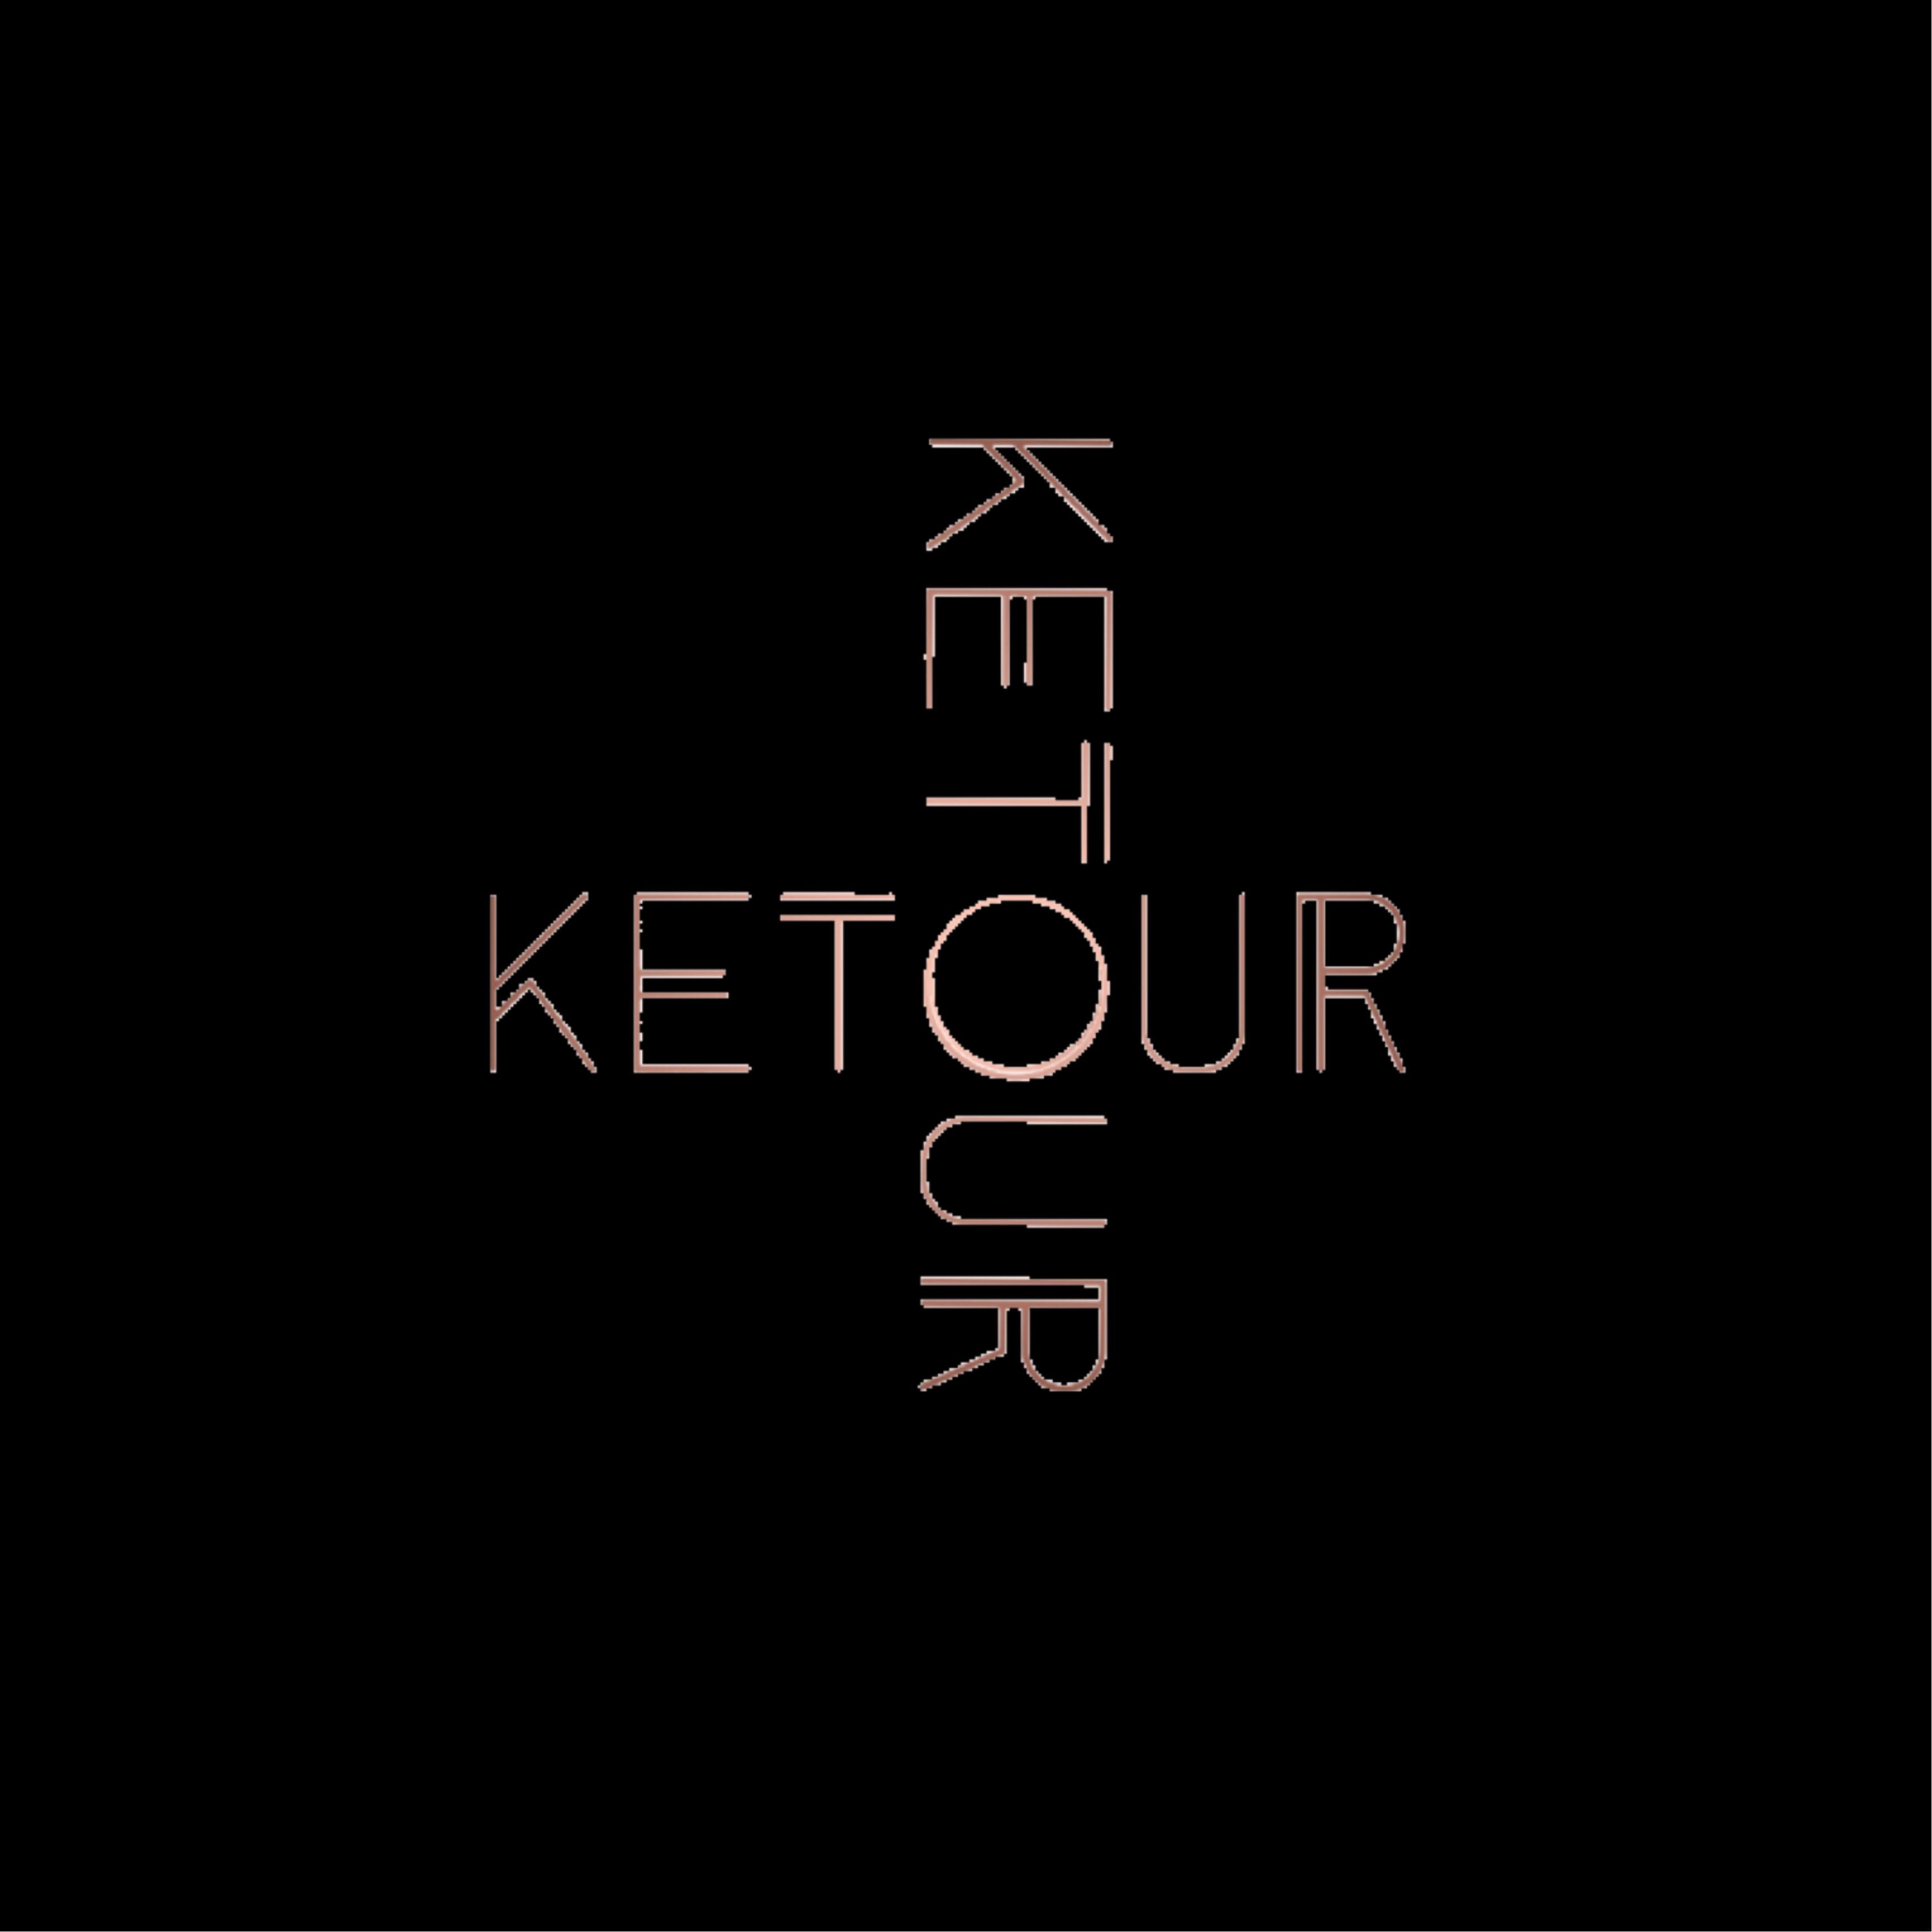 KeTour